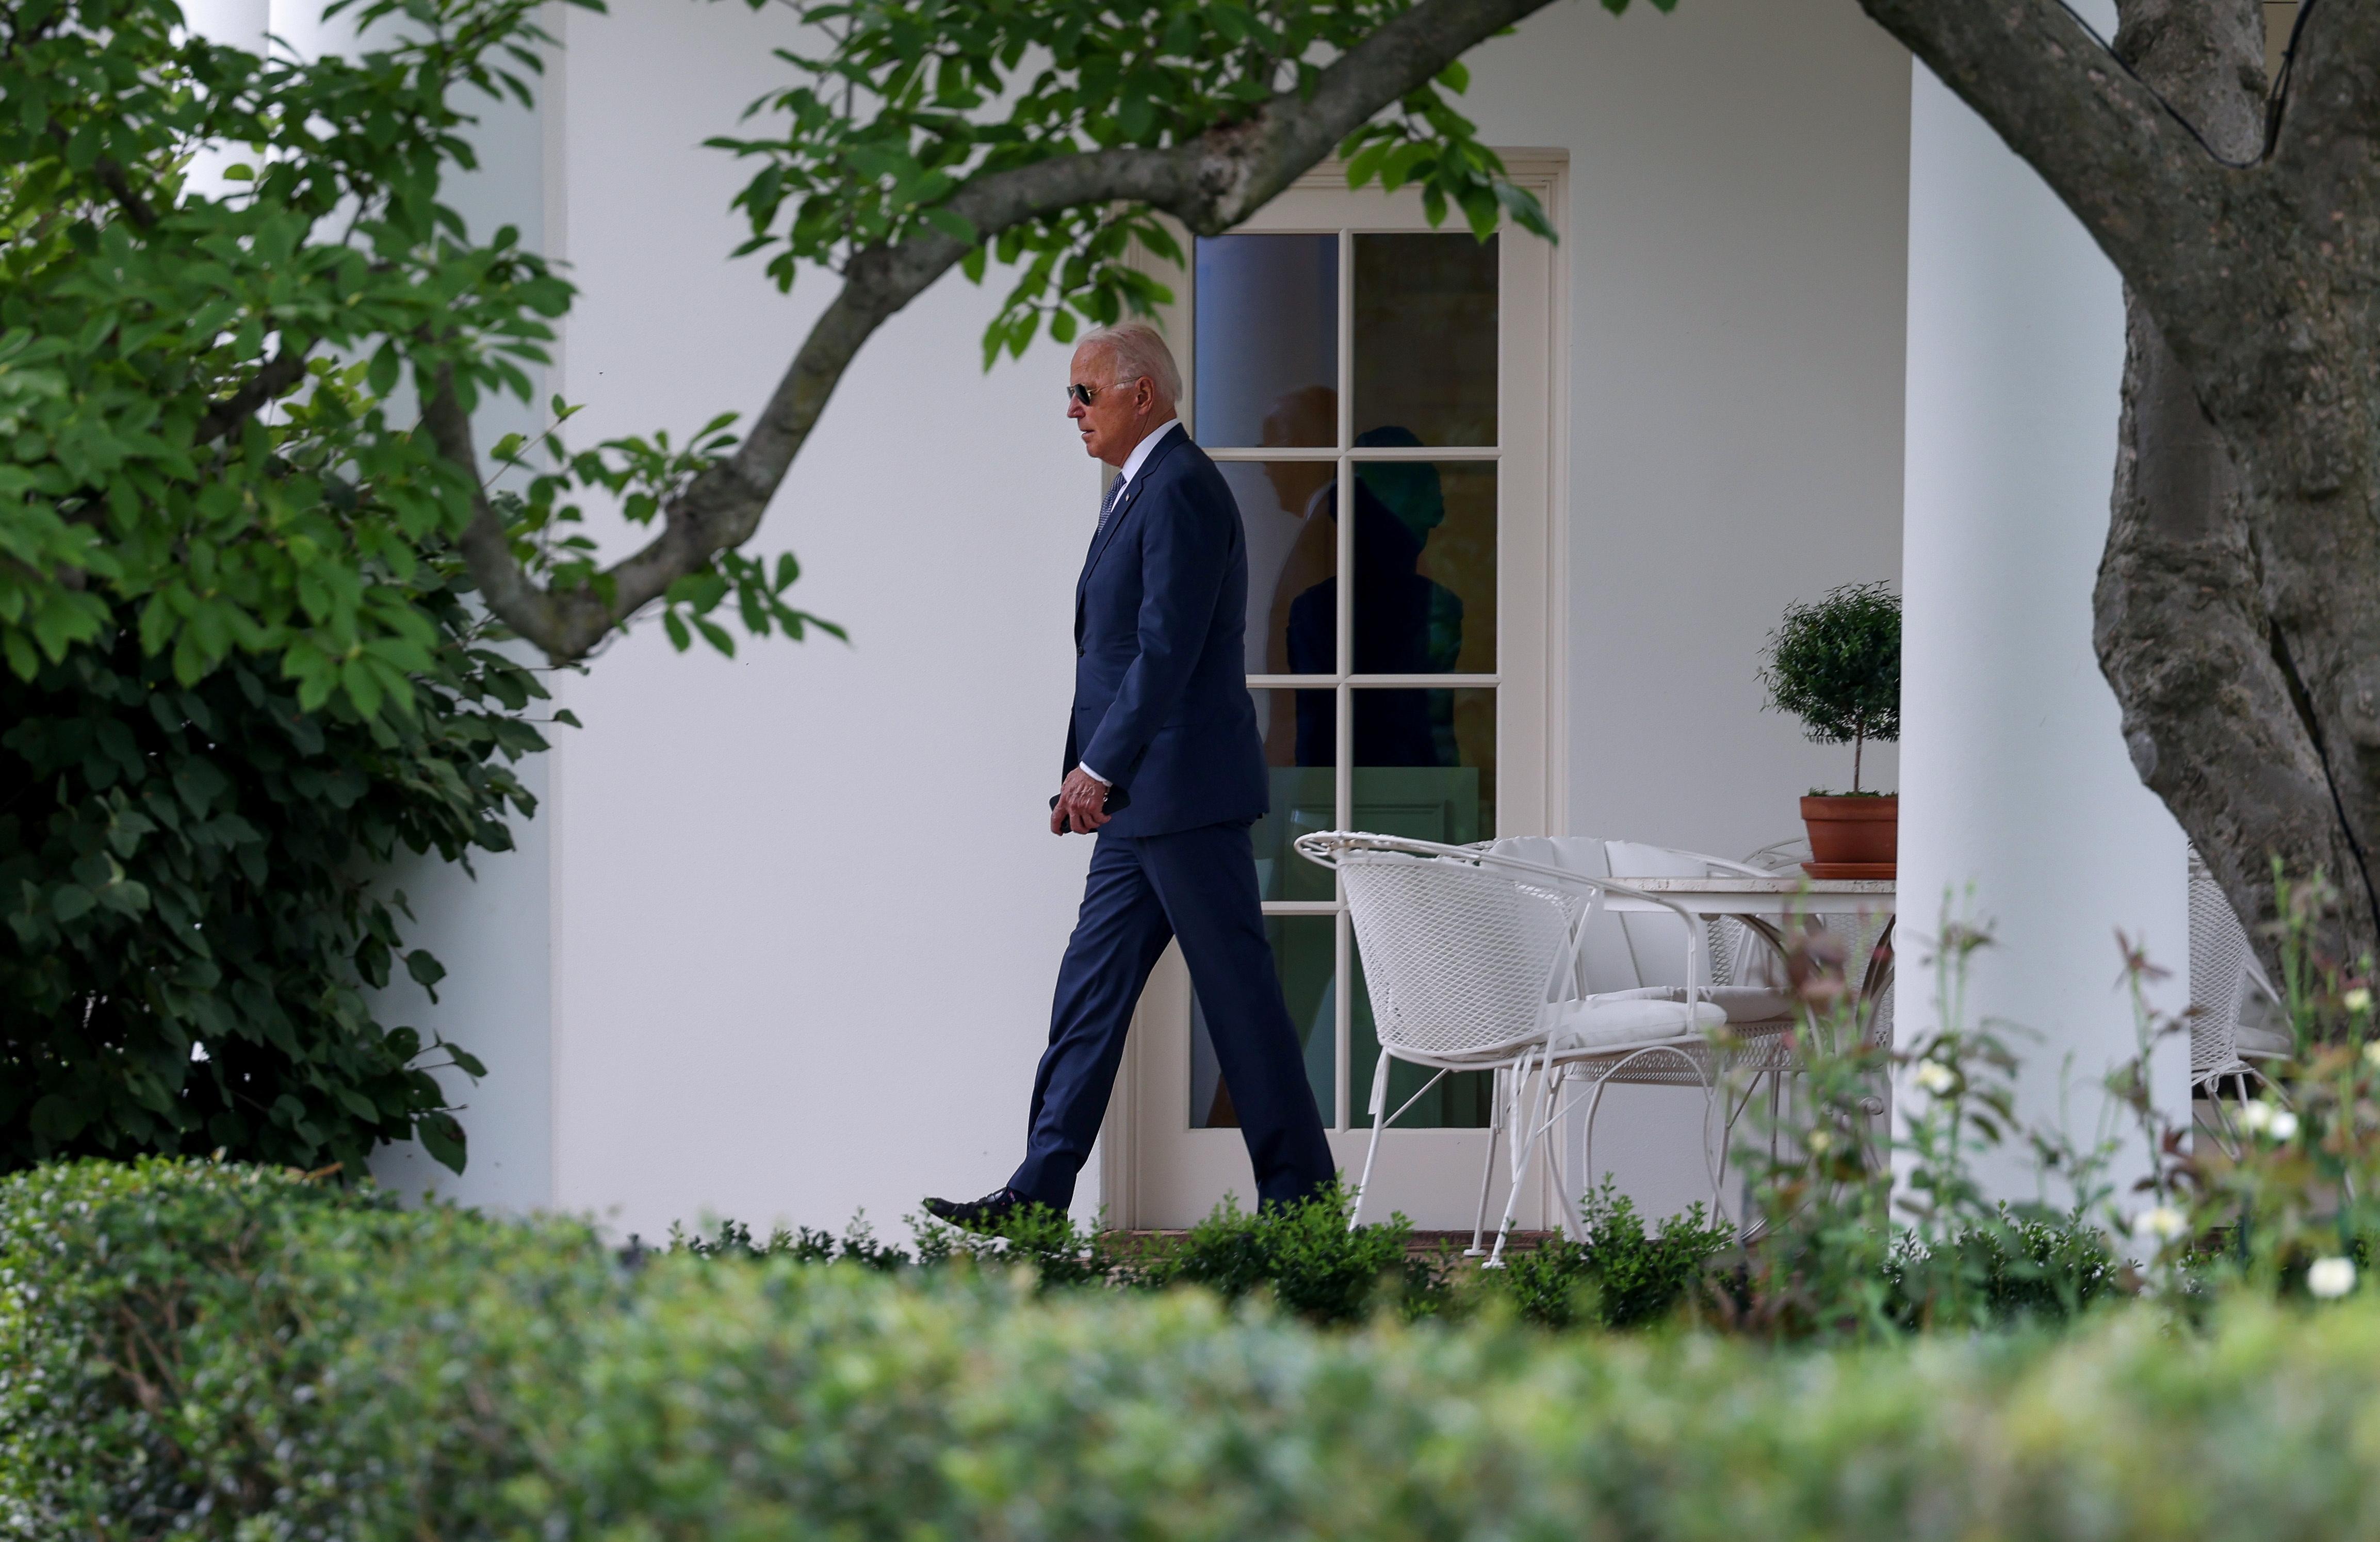 U.S. President Joe Biden departs the White House in Washington, U.S., July 9, 2021. REUTERS/Evelyn Hockstein